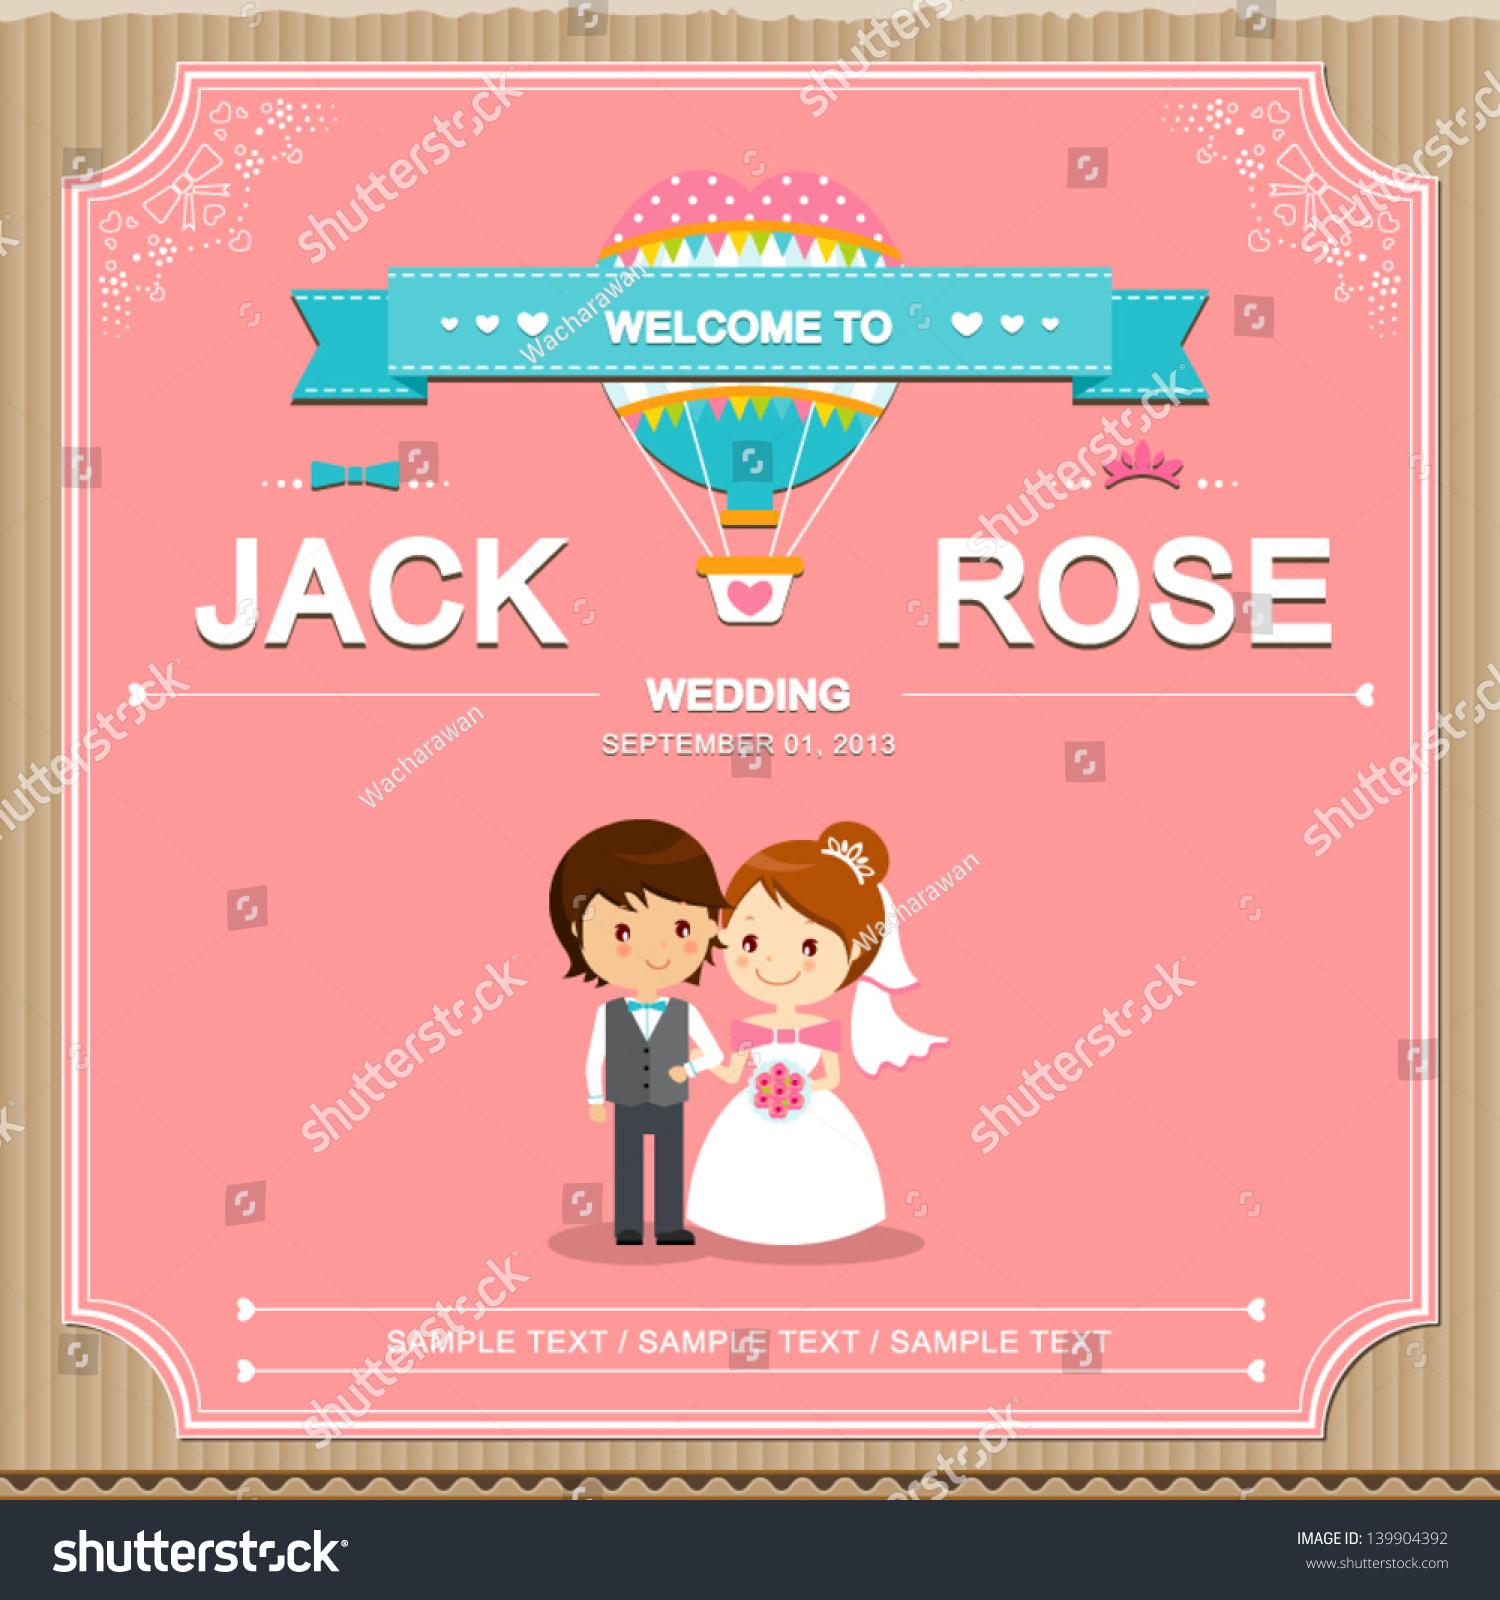 free wedding invitation wording templates wblqual com